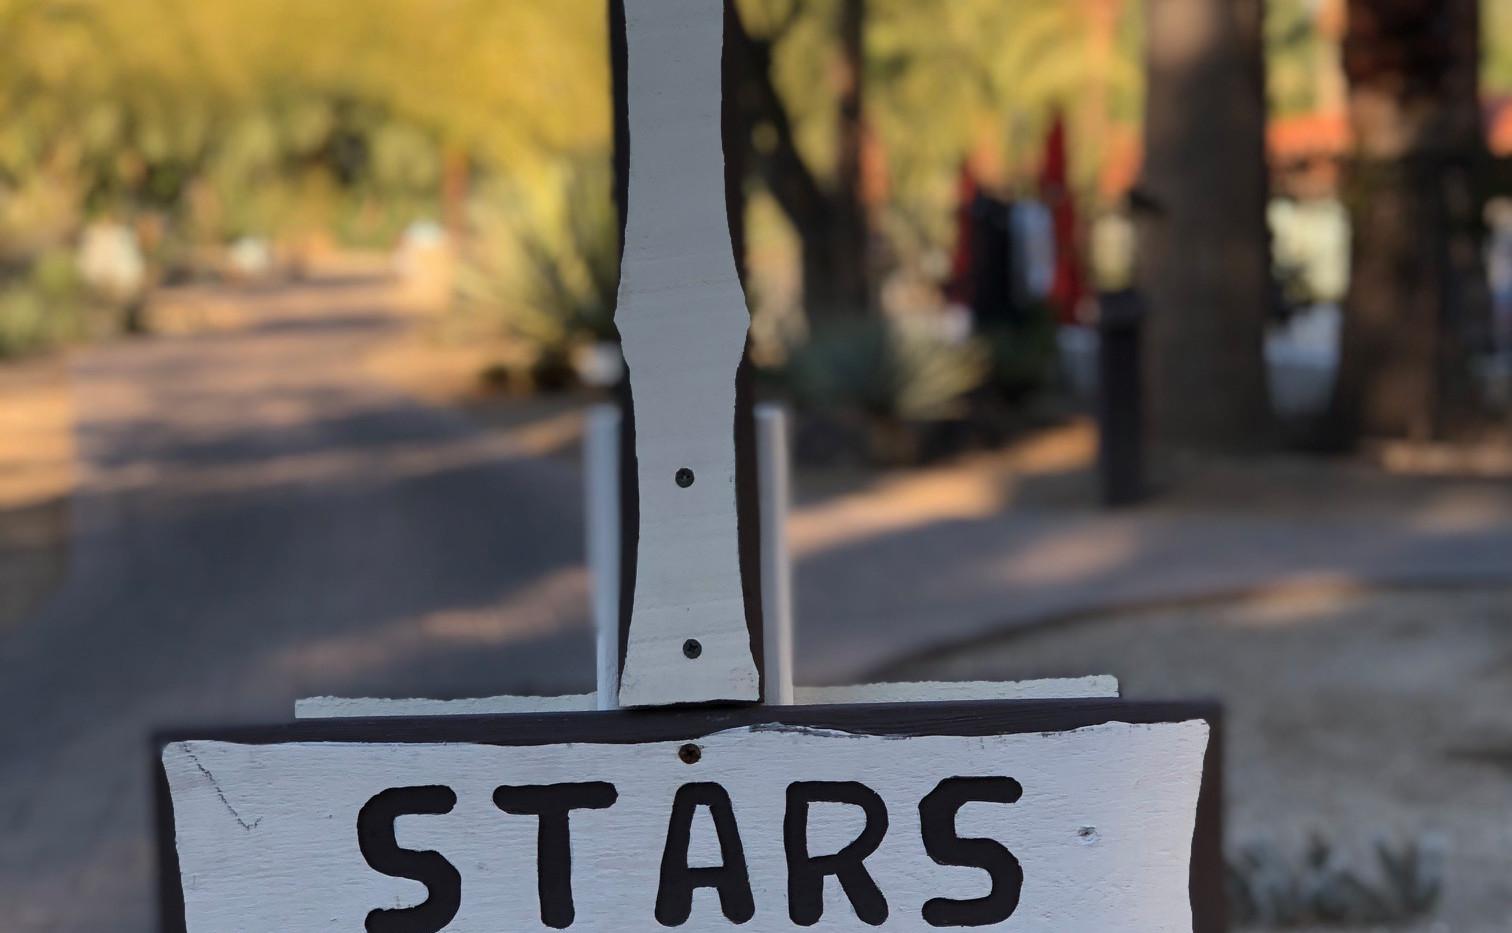 La Casa signage reminds visitors to look up